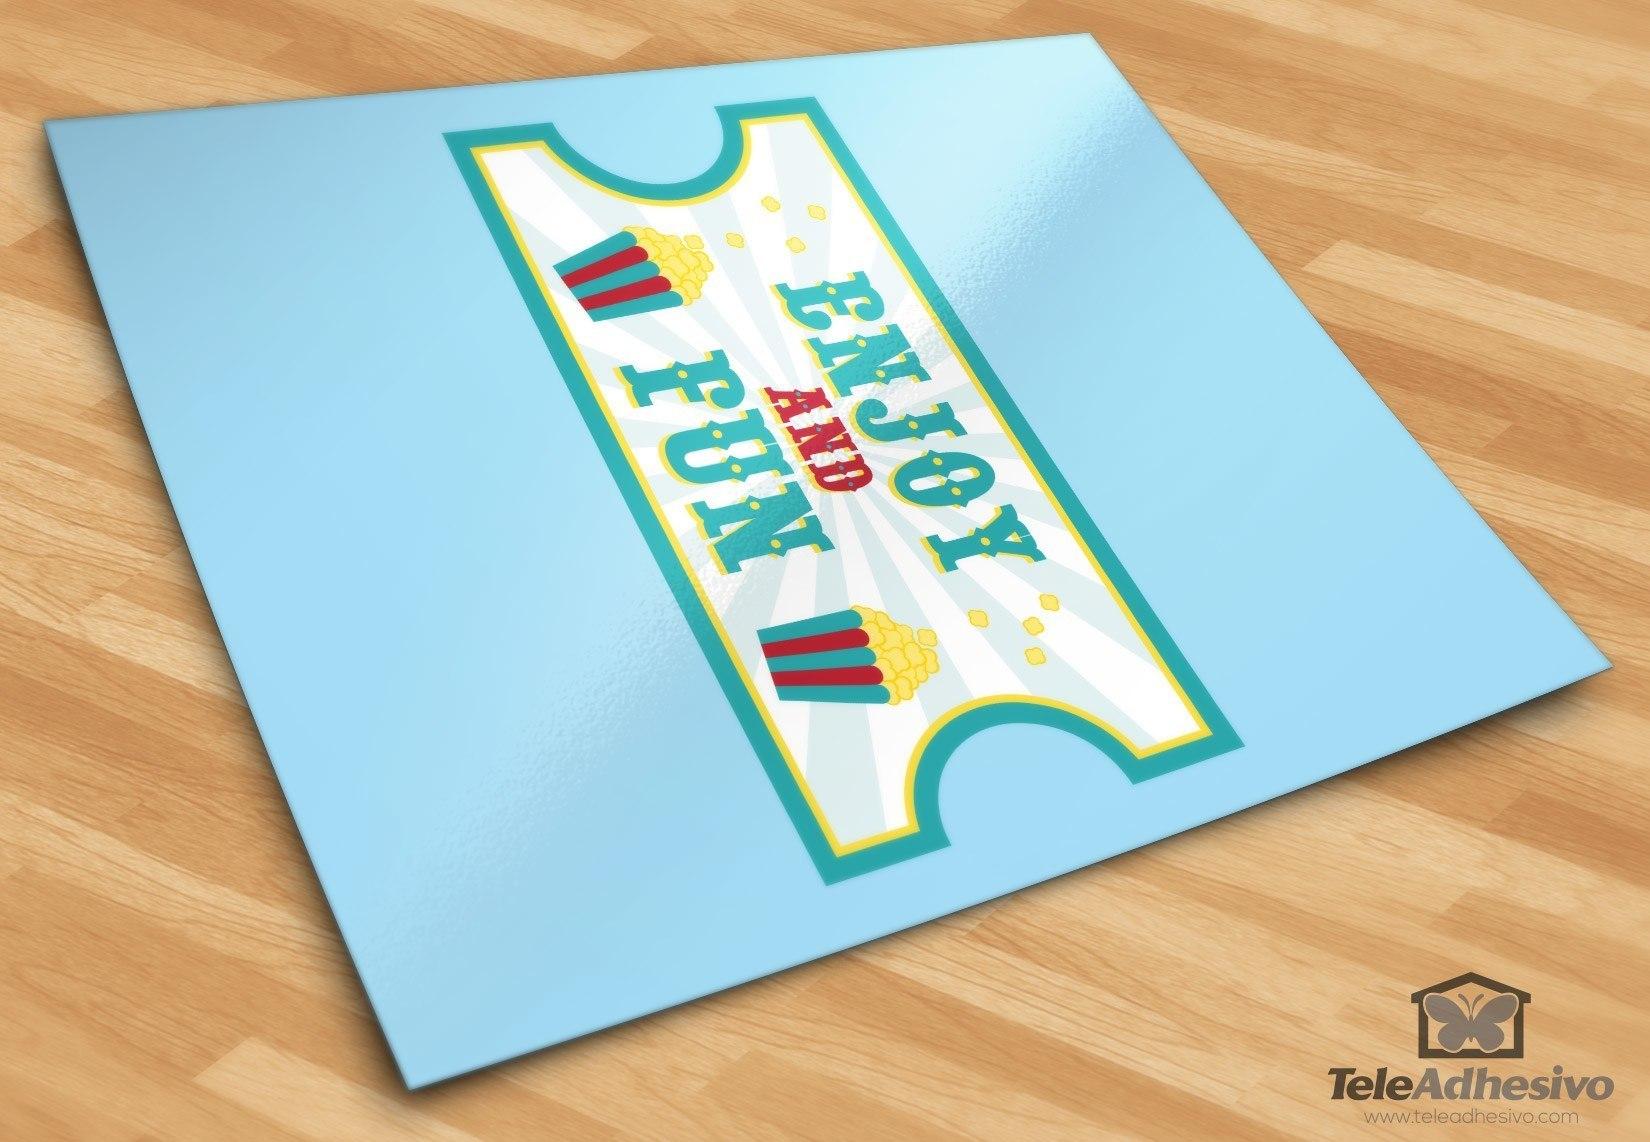 Kinderzimmer Wandtattoo: Ticket Circus 3